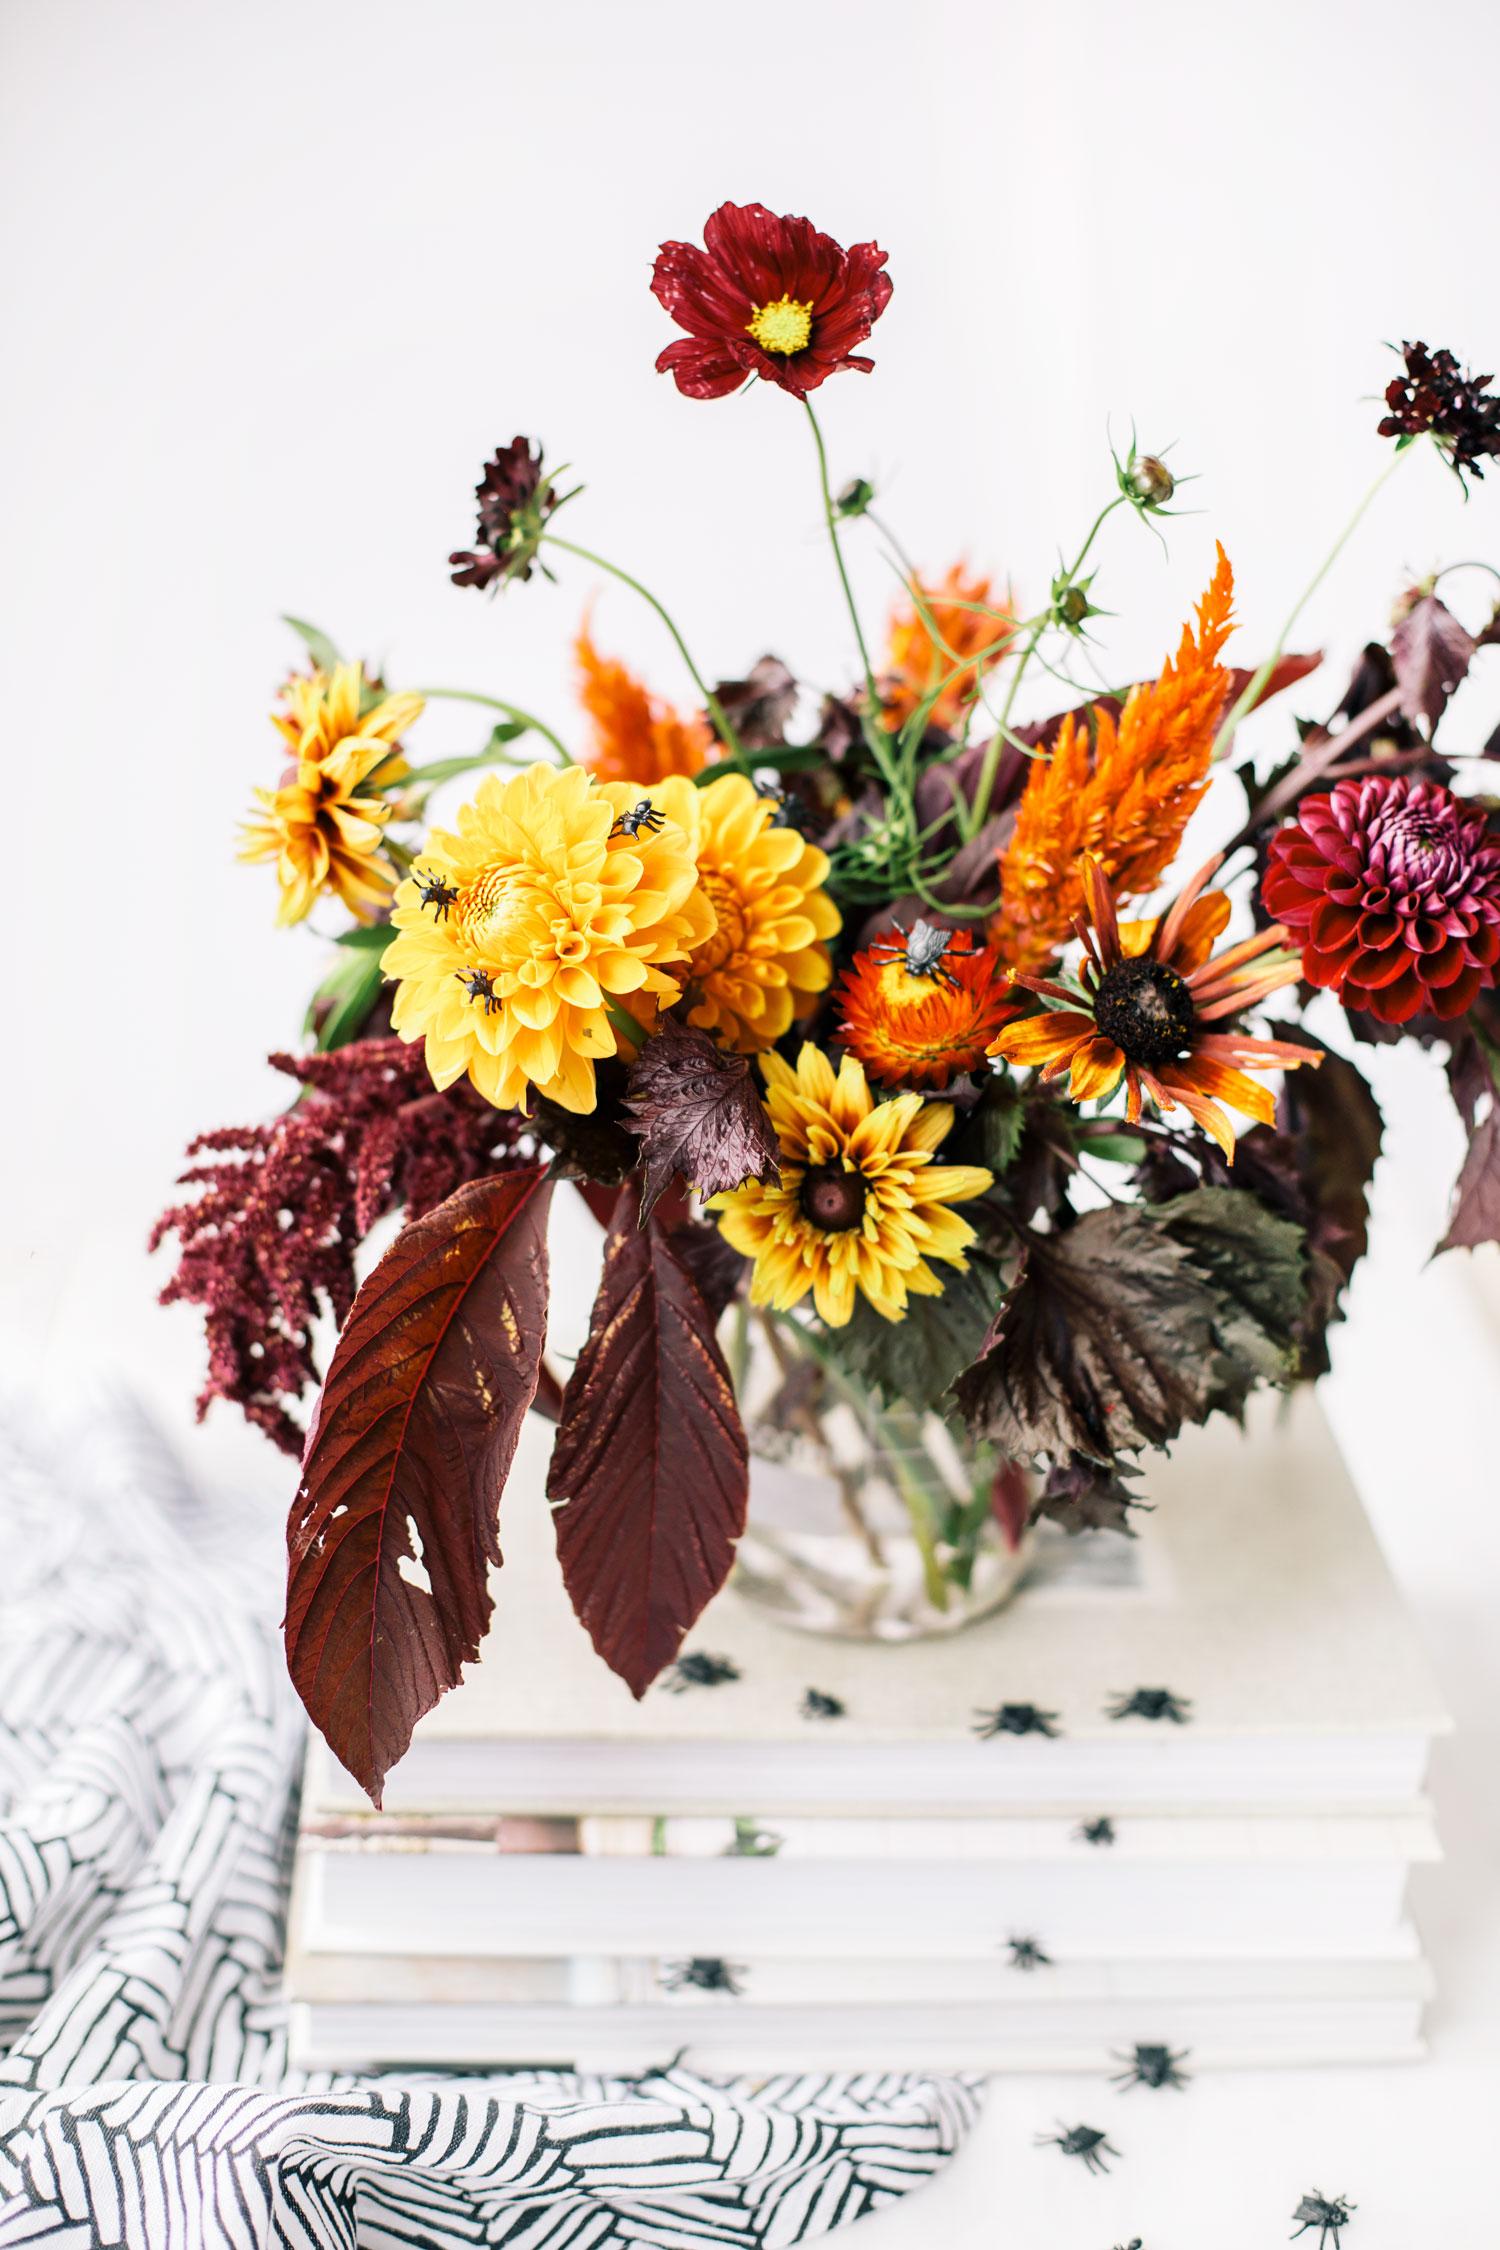 How To Make An Eerie Halloween Flower Arrangement The Blondielocks Life Style